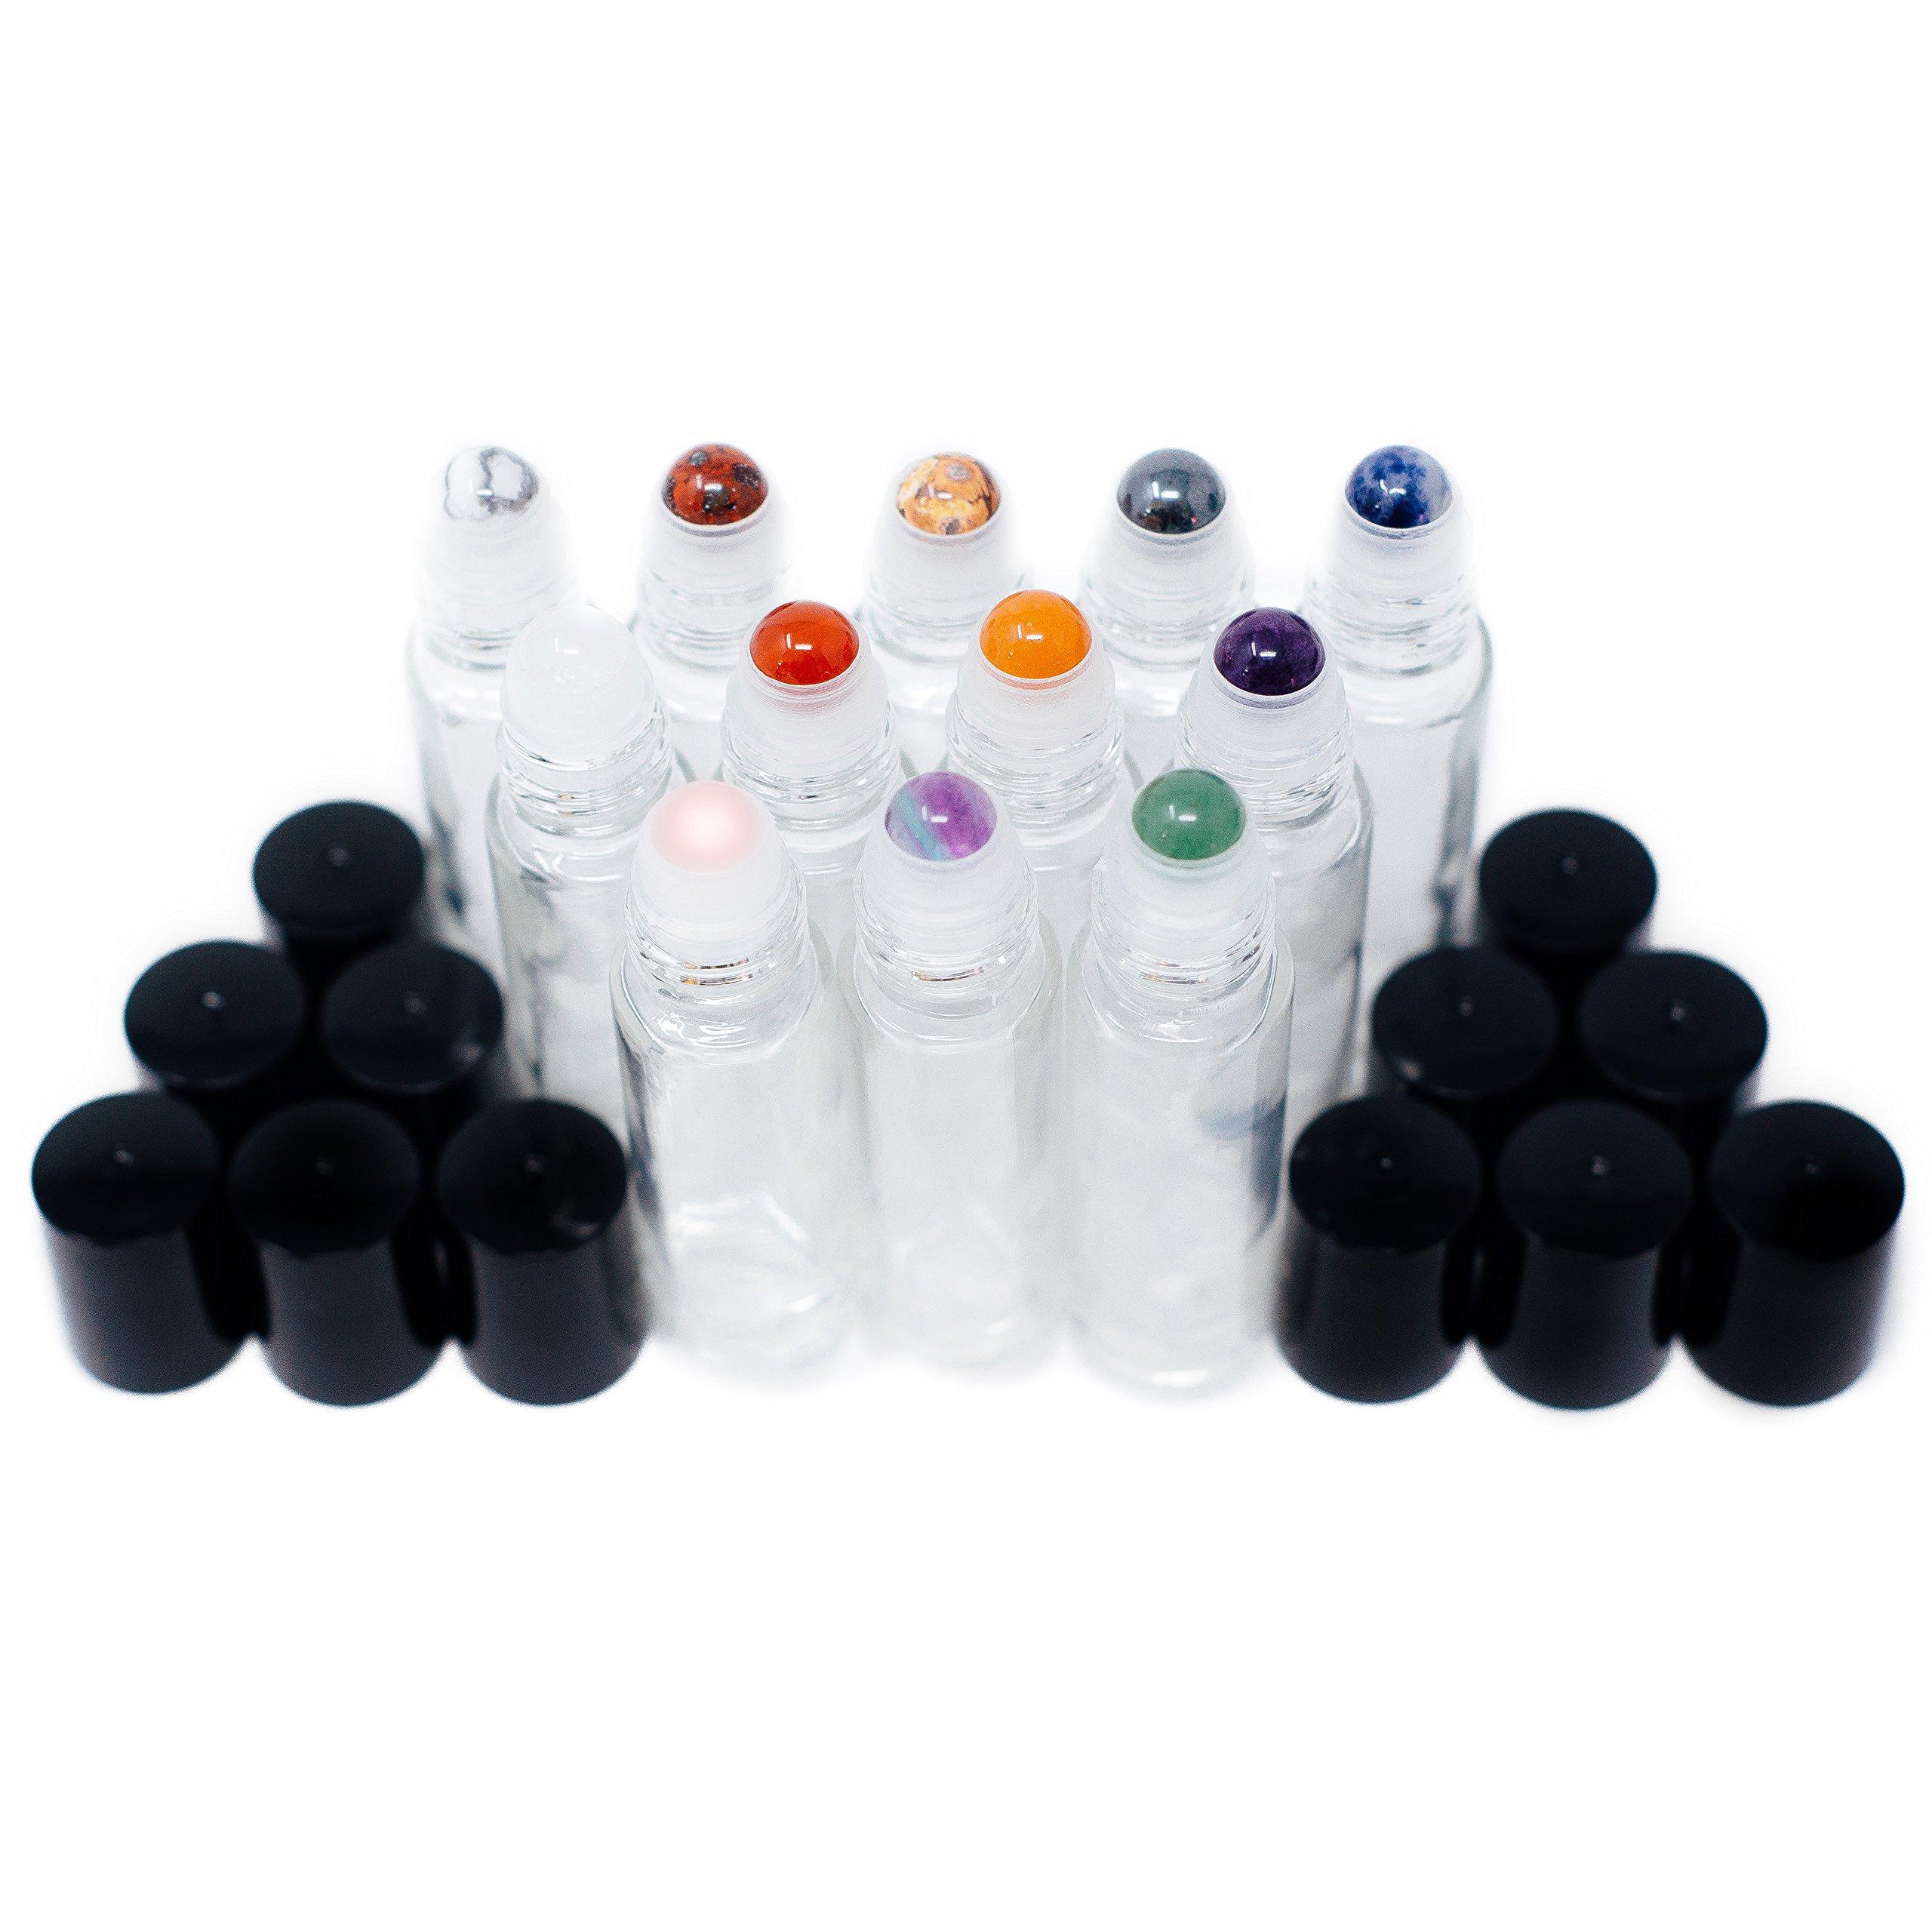 Gemstone Essential Oil Roller Bottles + Tops | Set of 12 Natural Crystals + Precious Stones | Gemstone Roller Balls | Unique Properties for Each Gemstone | Luxe Gift | Black Tops + 10ml Glass Bottles